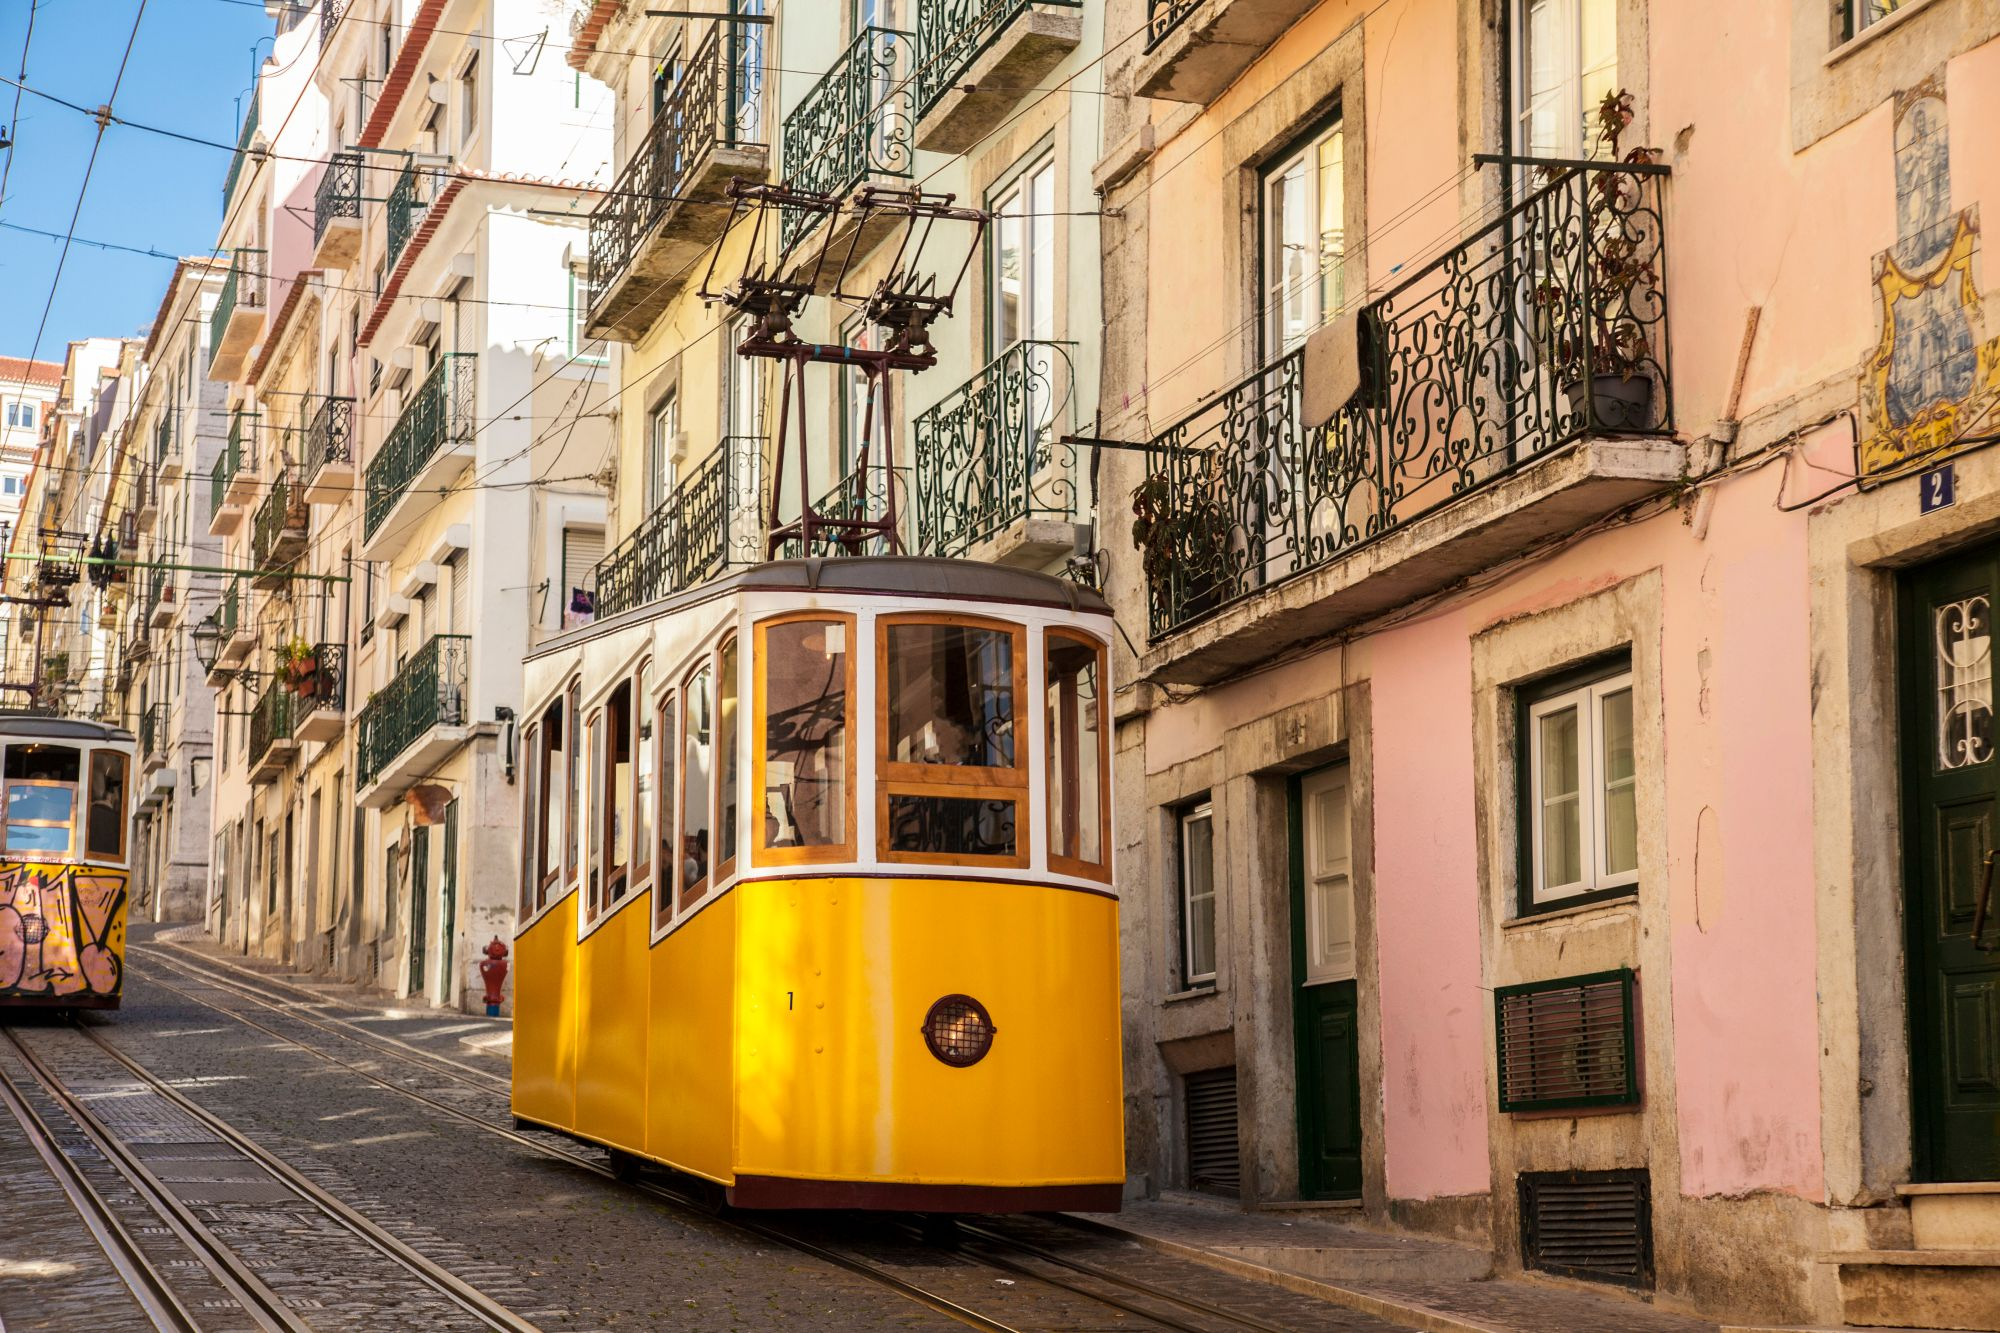 Lizbona widok tramwaju